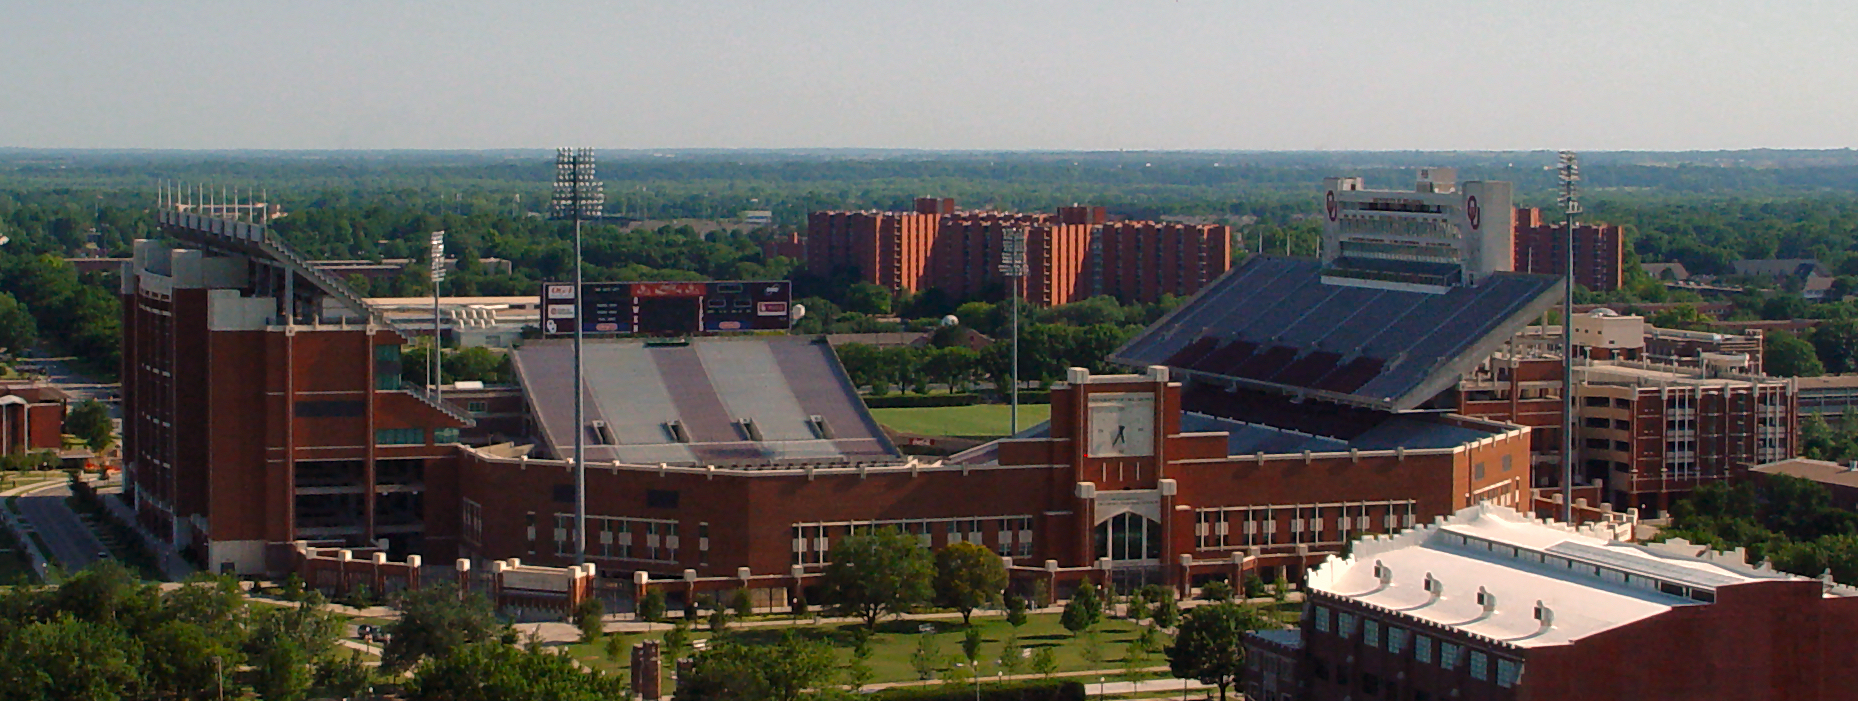 gaylord family oklahoma memorial stadium amazing college stadiums